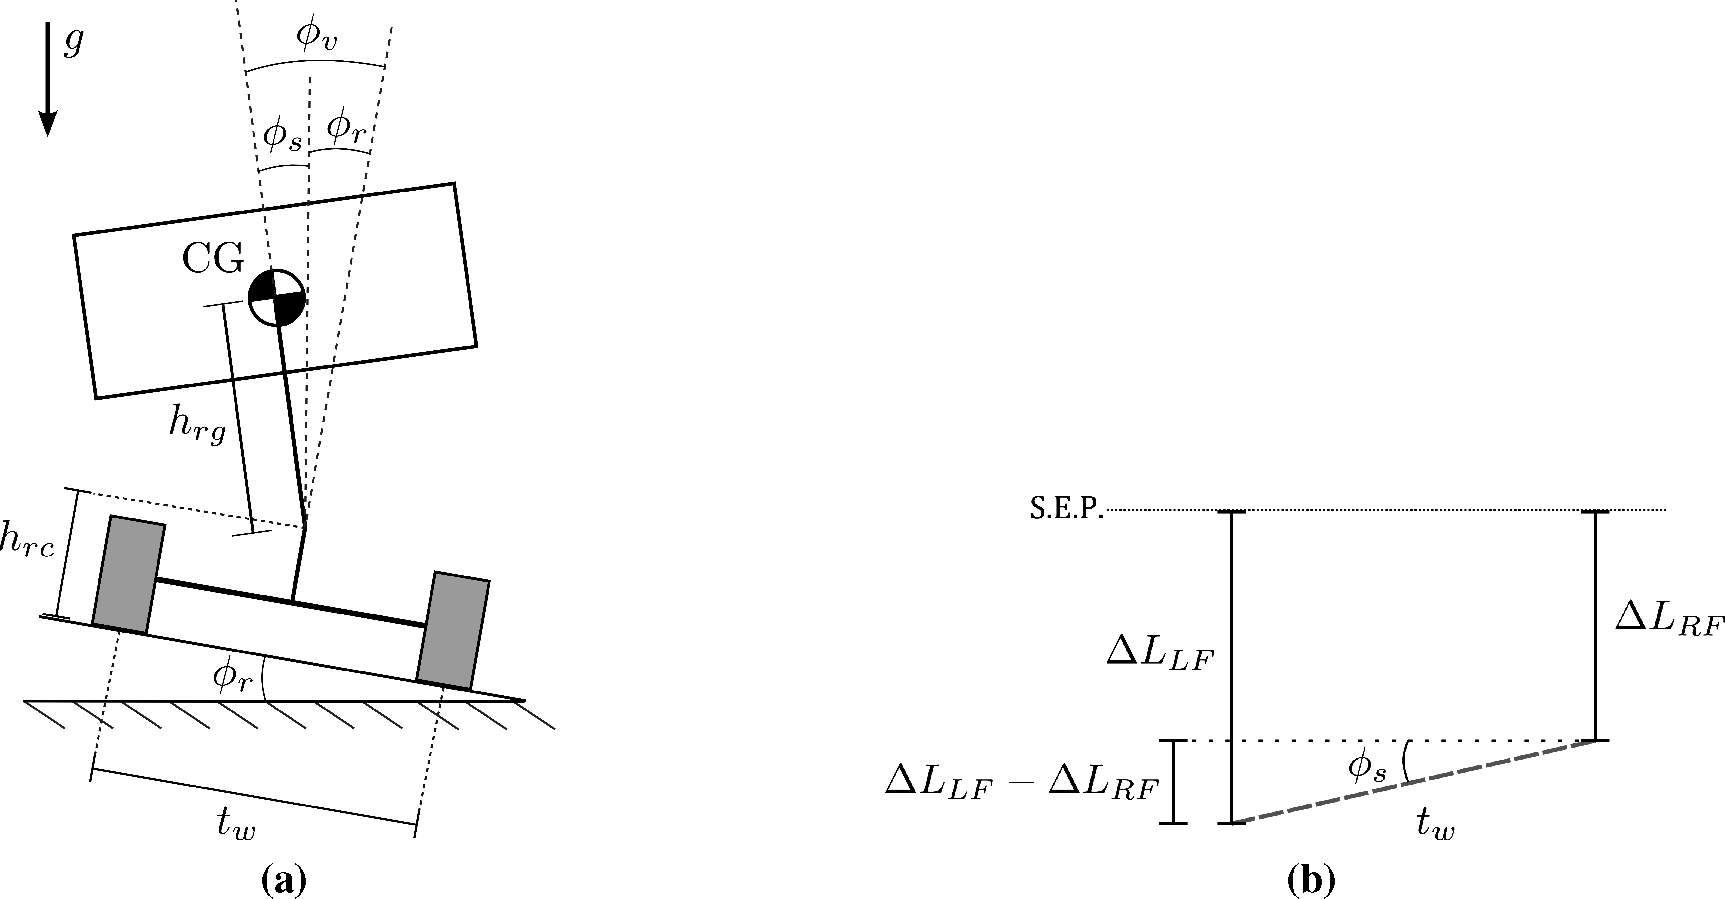 Purdue owl argumentative research paper